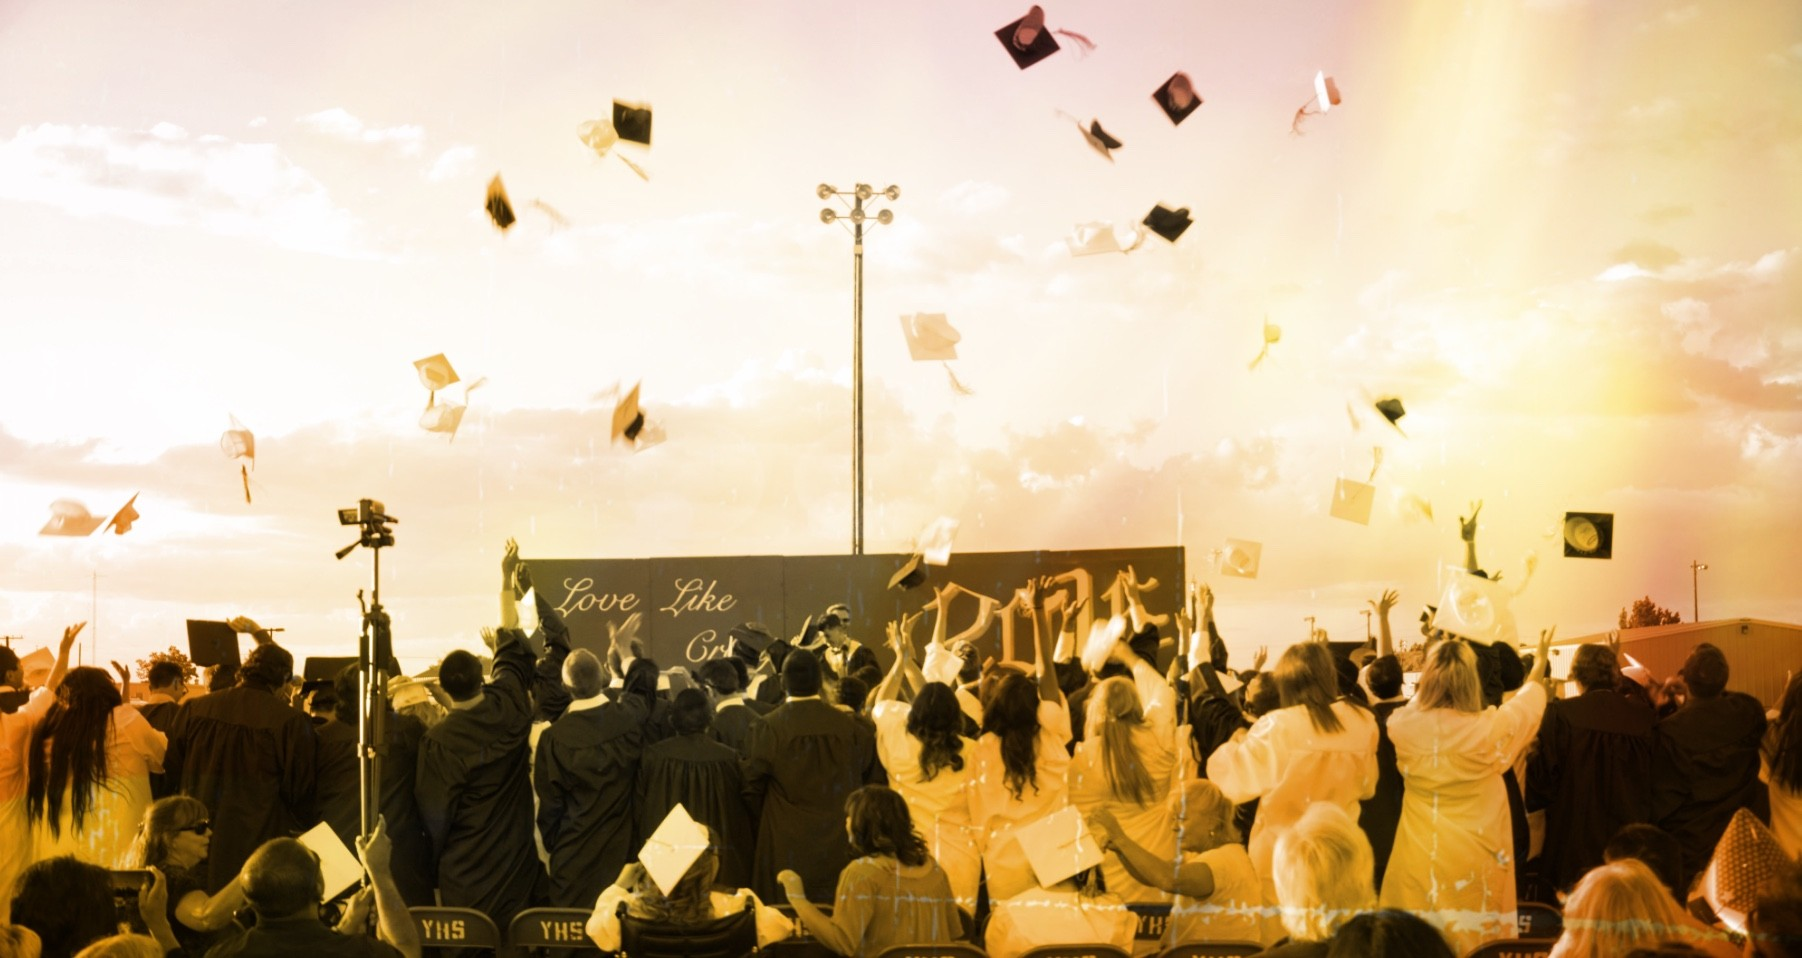 Lyon County School District | LinkedIn